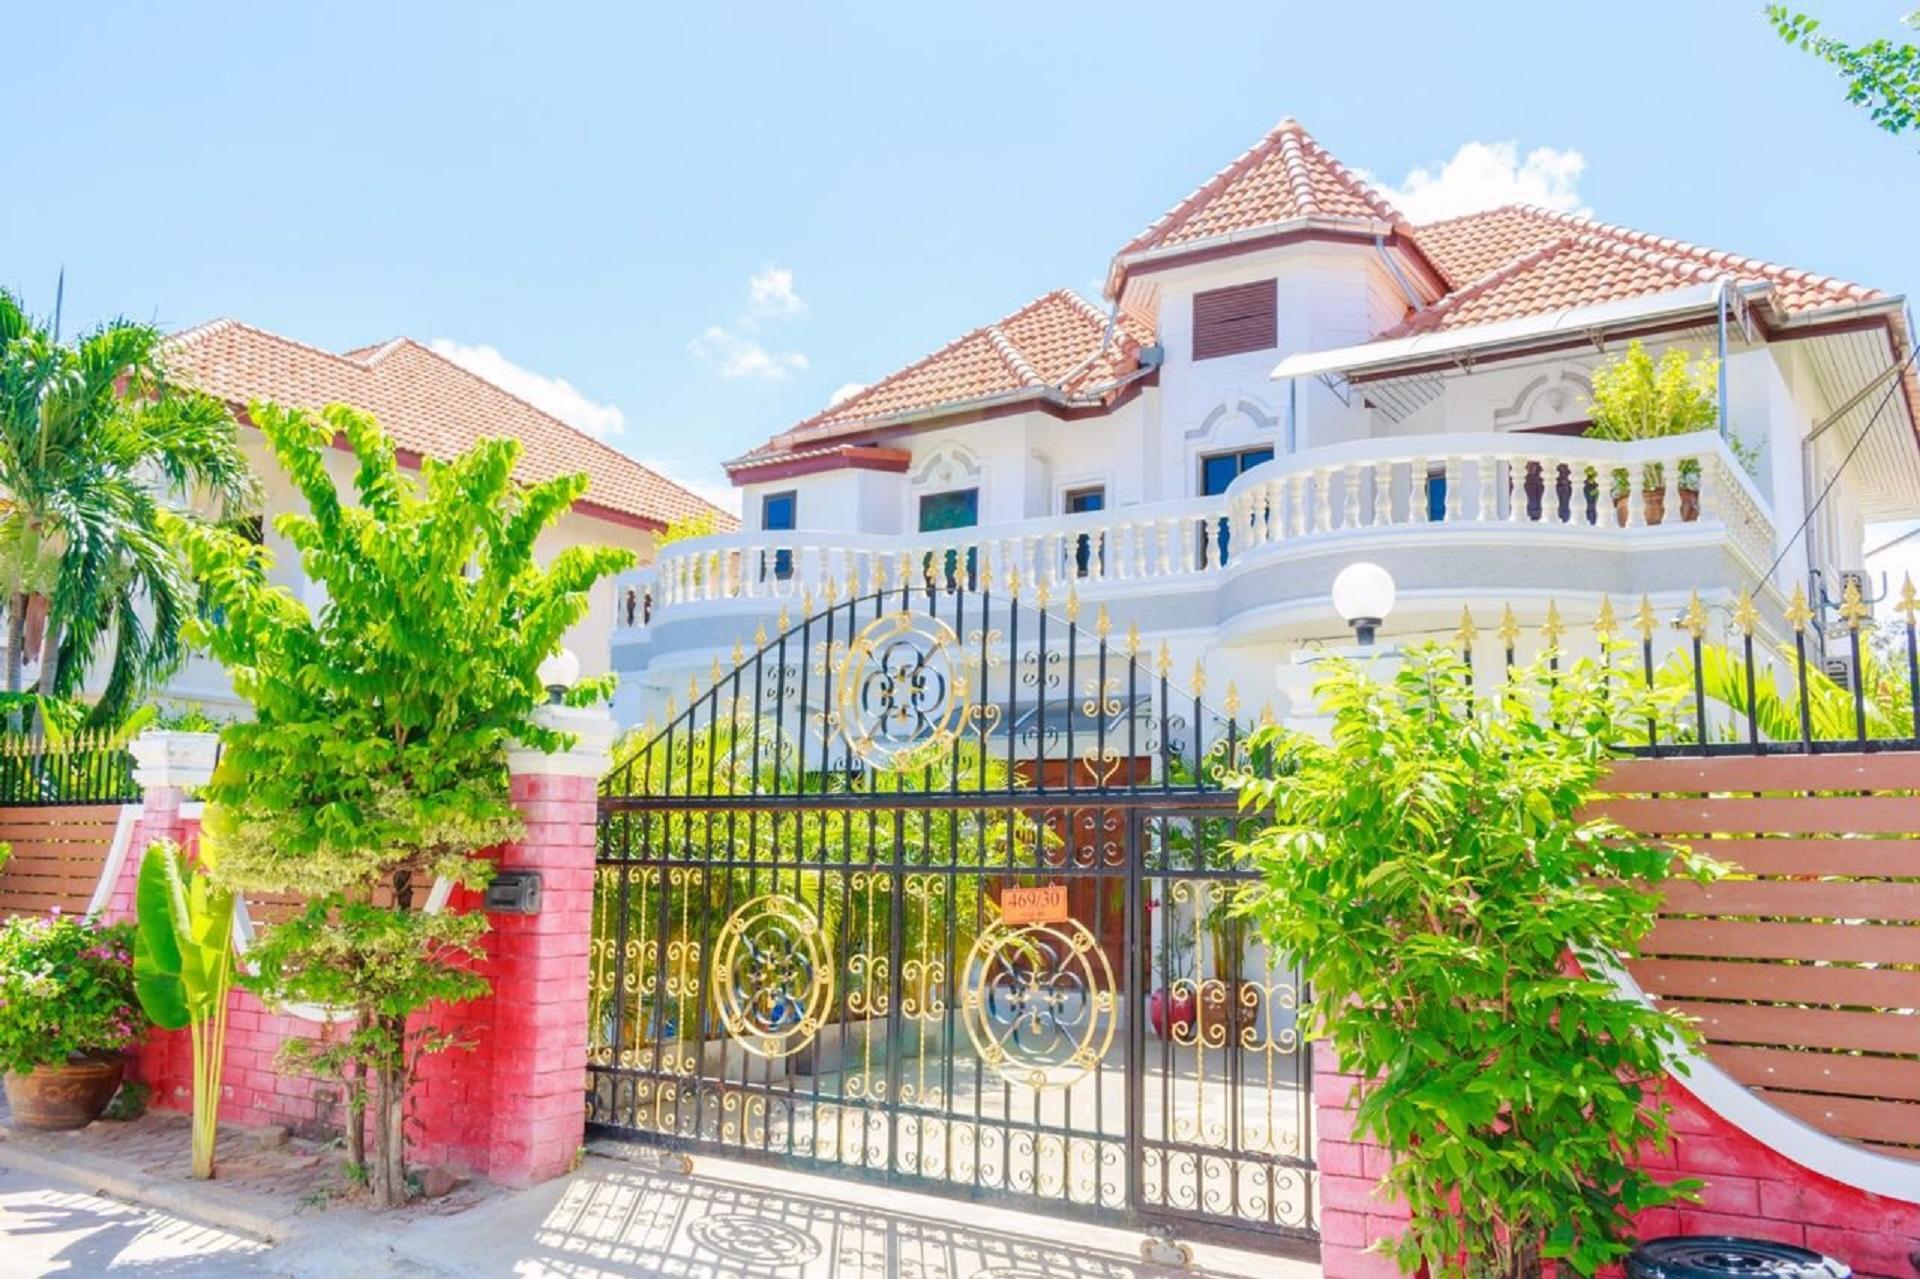 Pool villa 6 bedrooms near walking street & beach,Pool villa 6 bedrooms near walking street & beach